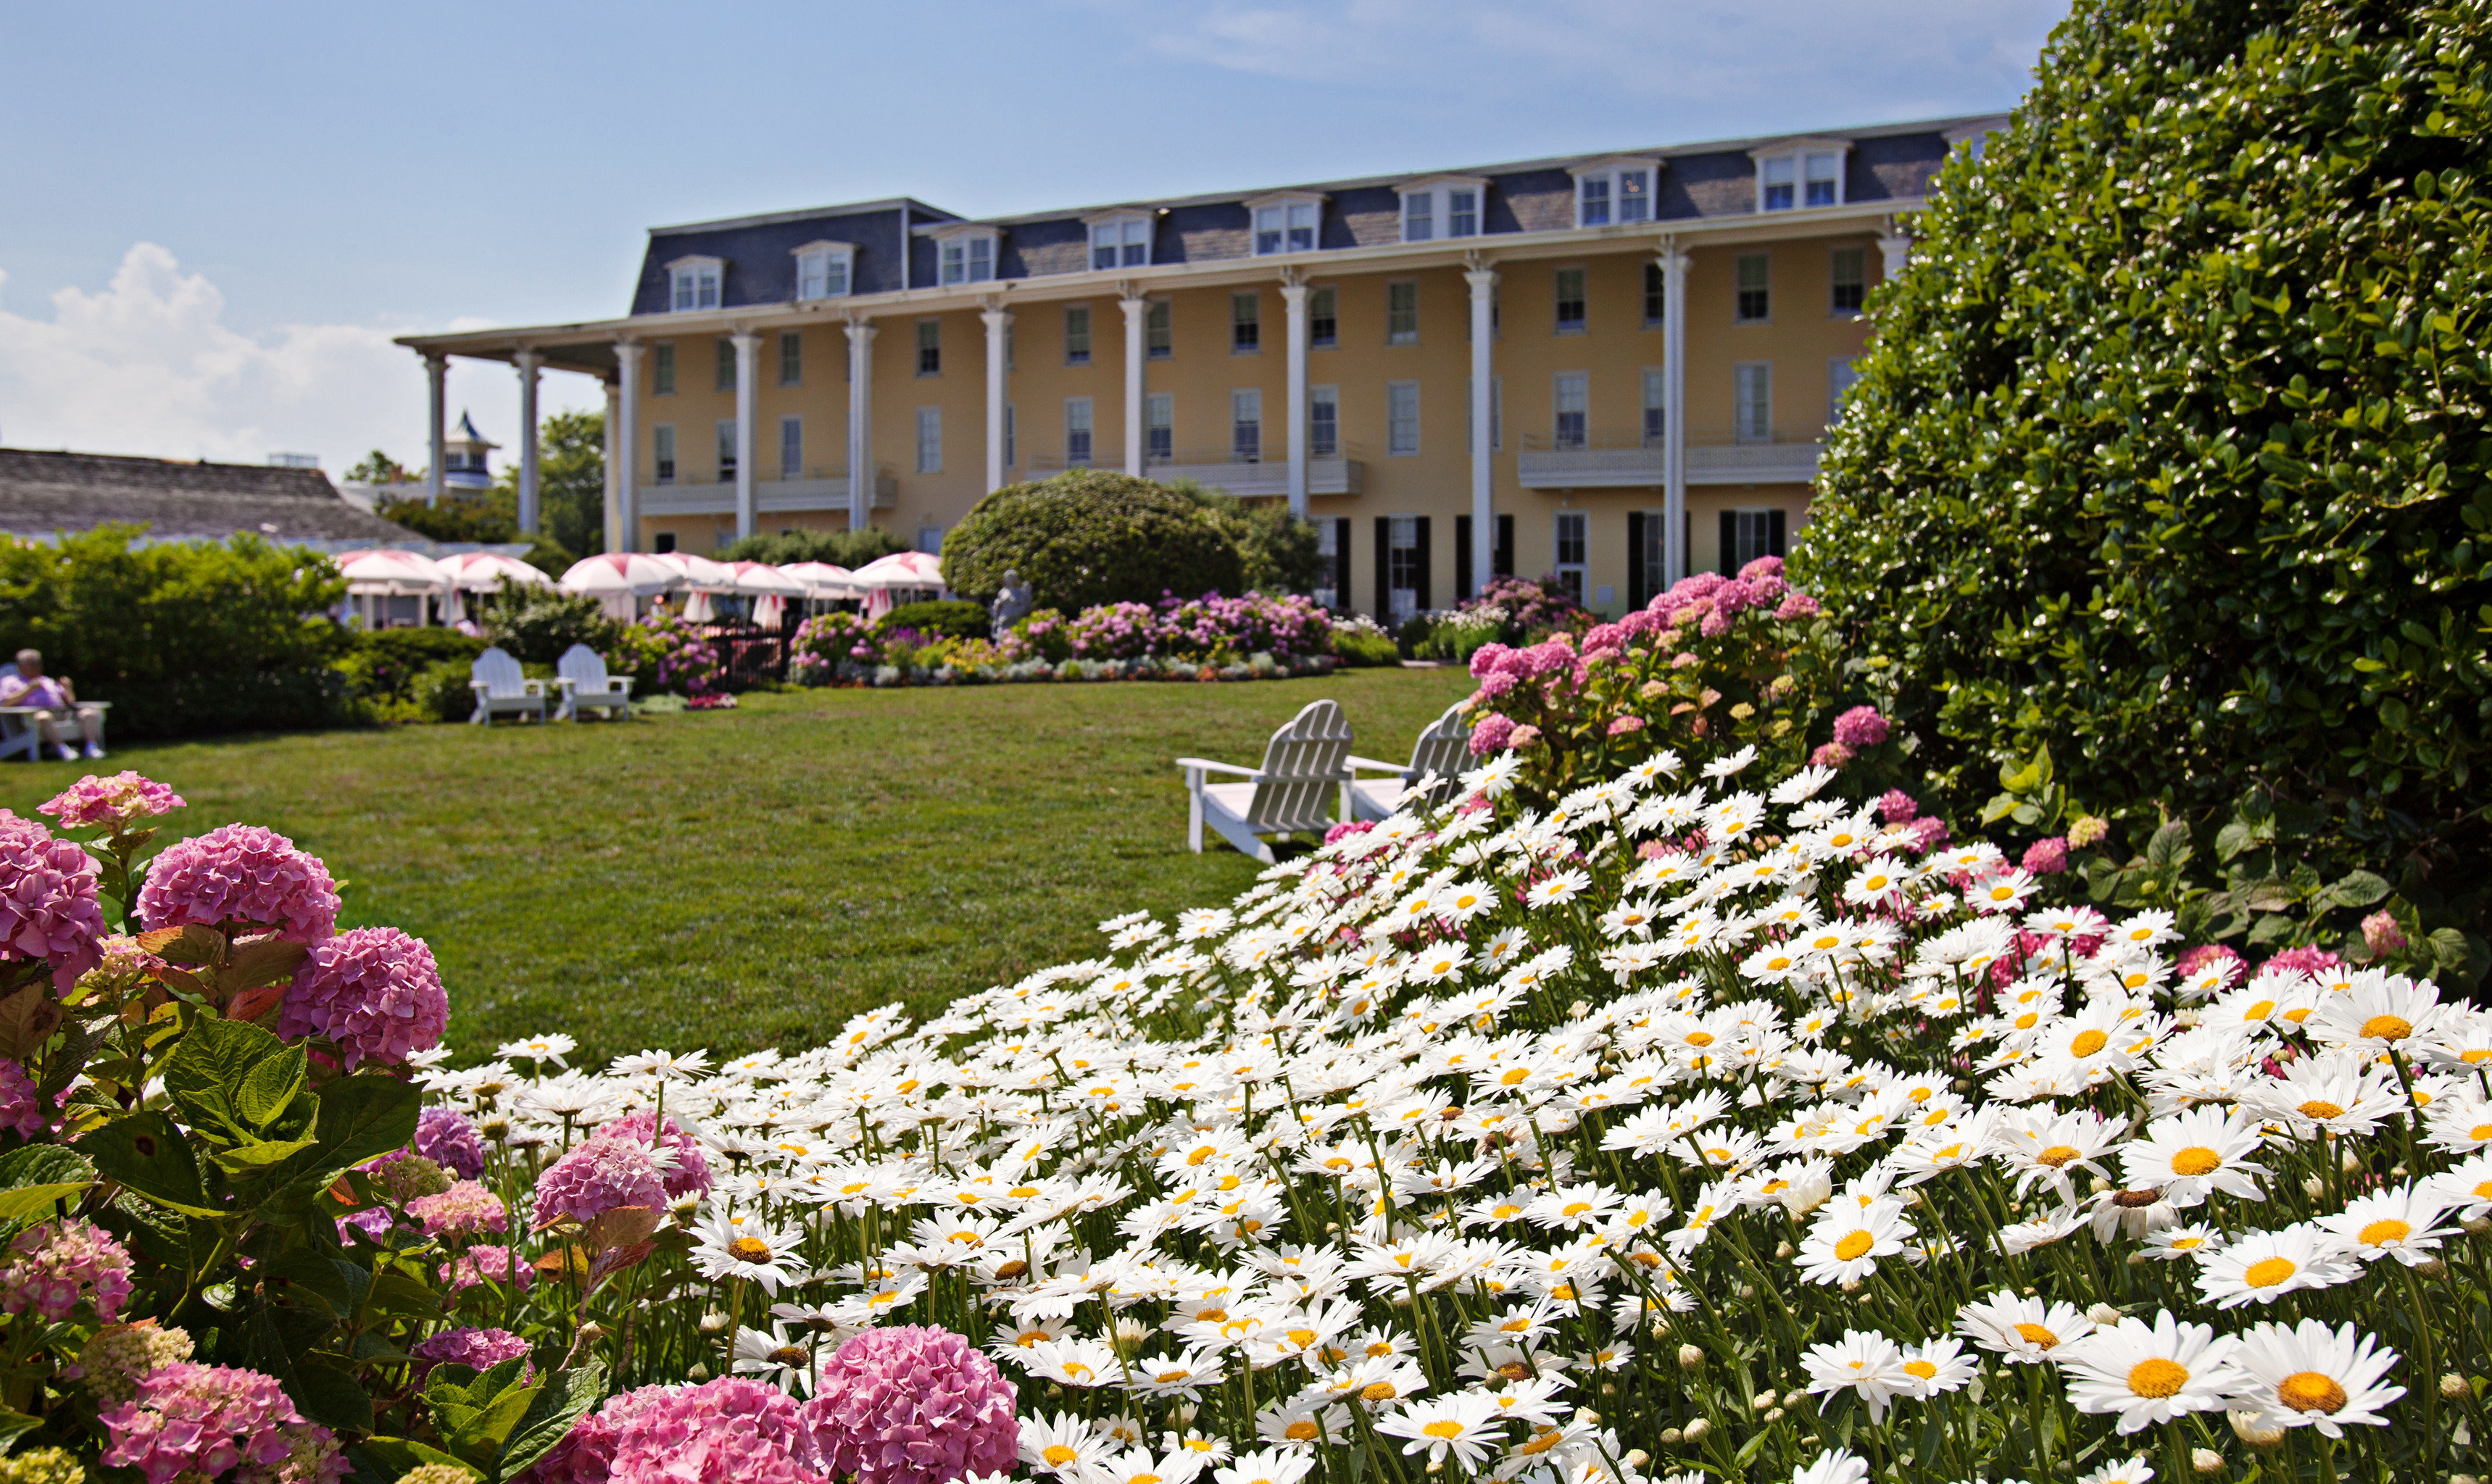 Exterior Garden Grounds Historic Hotels flower grass flora plant botany floristry lawn botanical garden park crowd